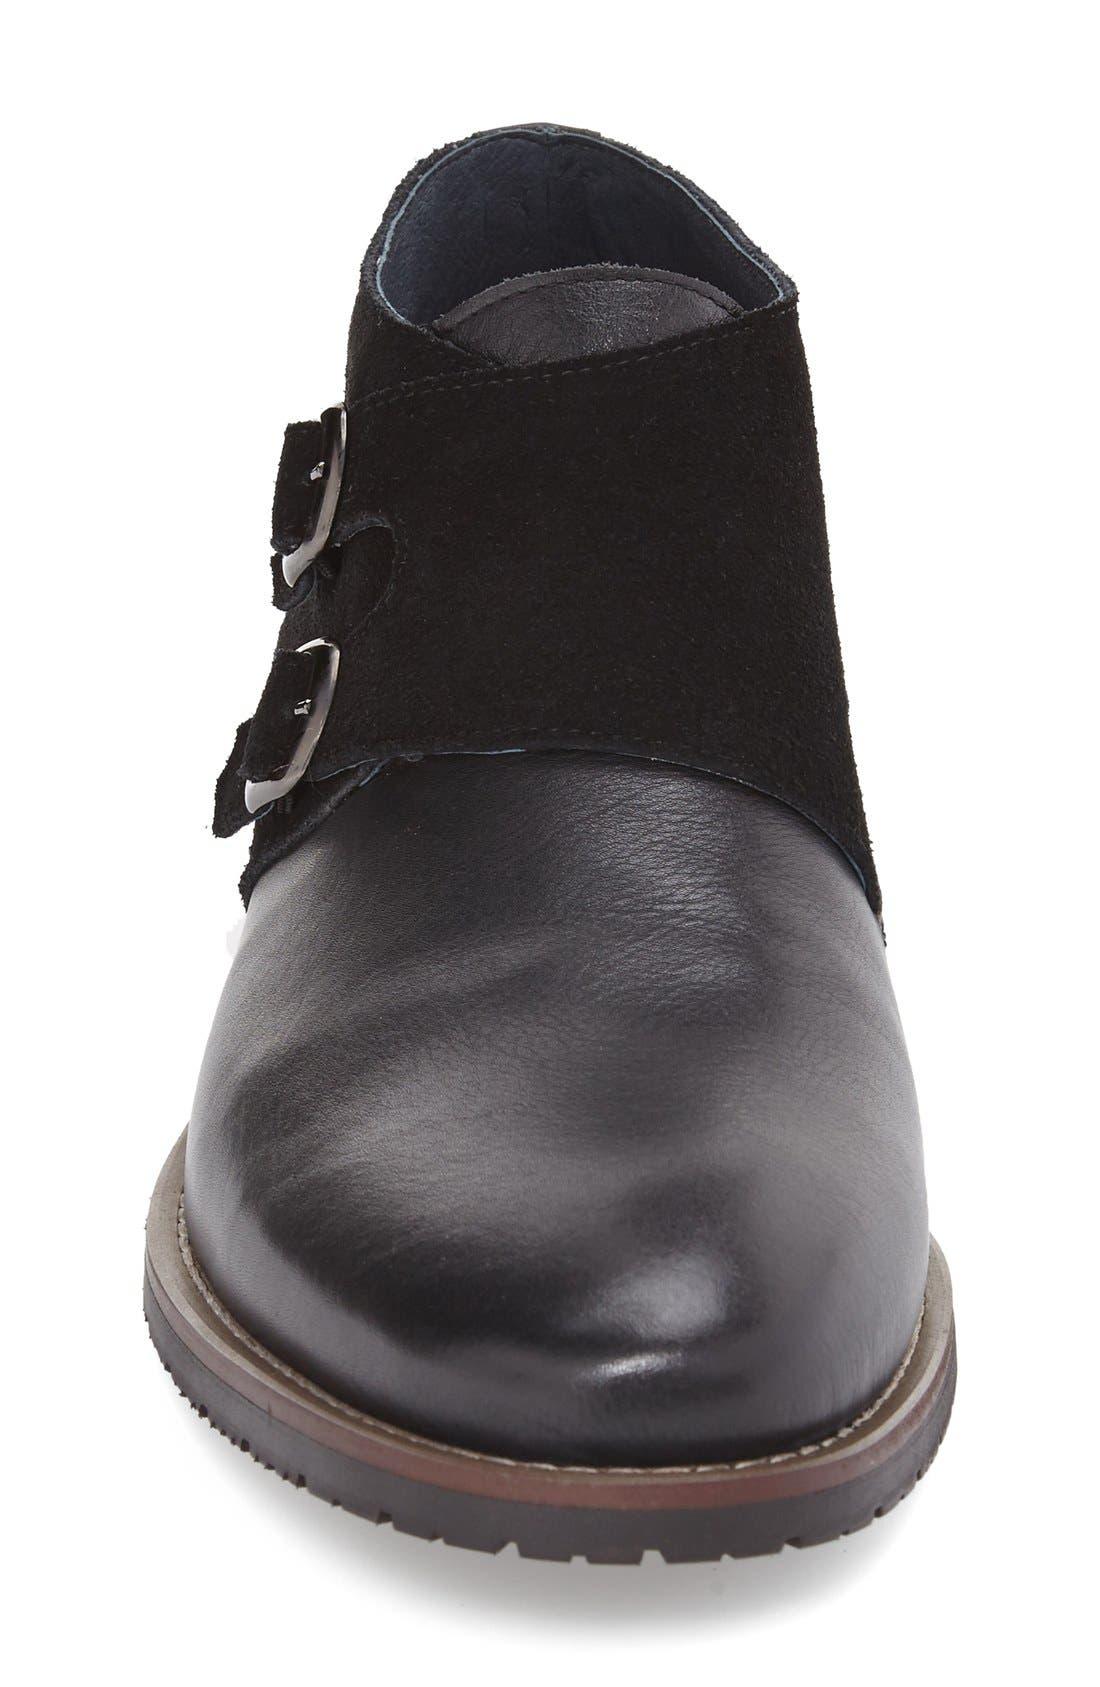 'Napoli' Double Monk Strap Shoe,                             Alternate thumbnail 4, color,                             001